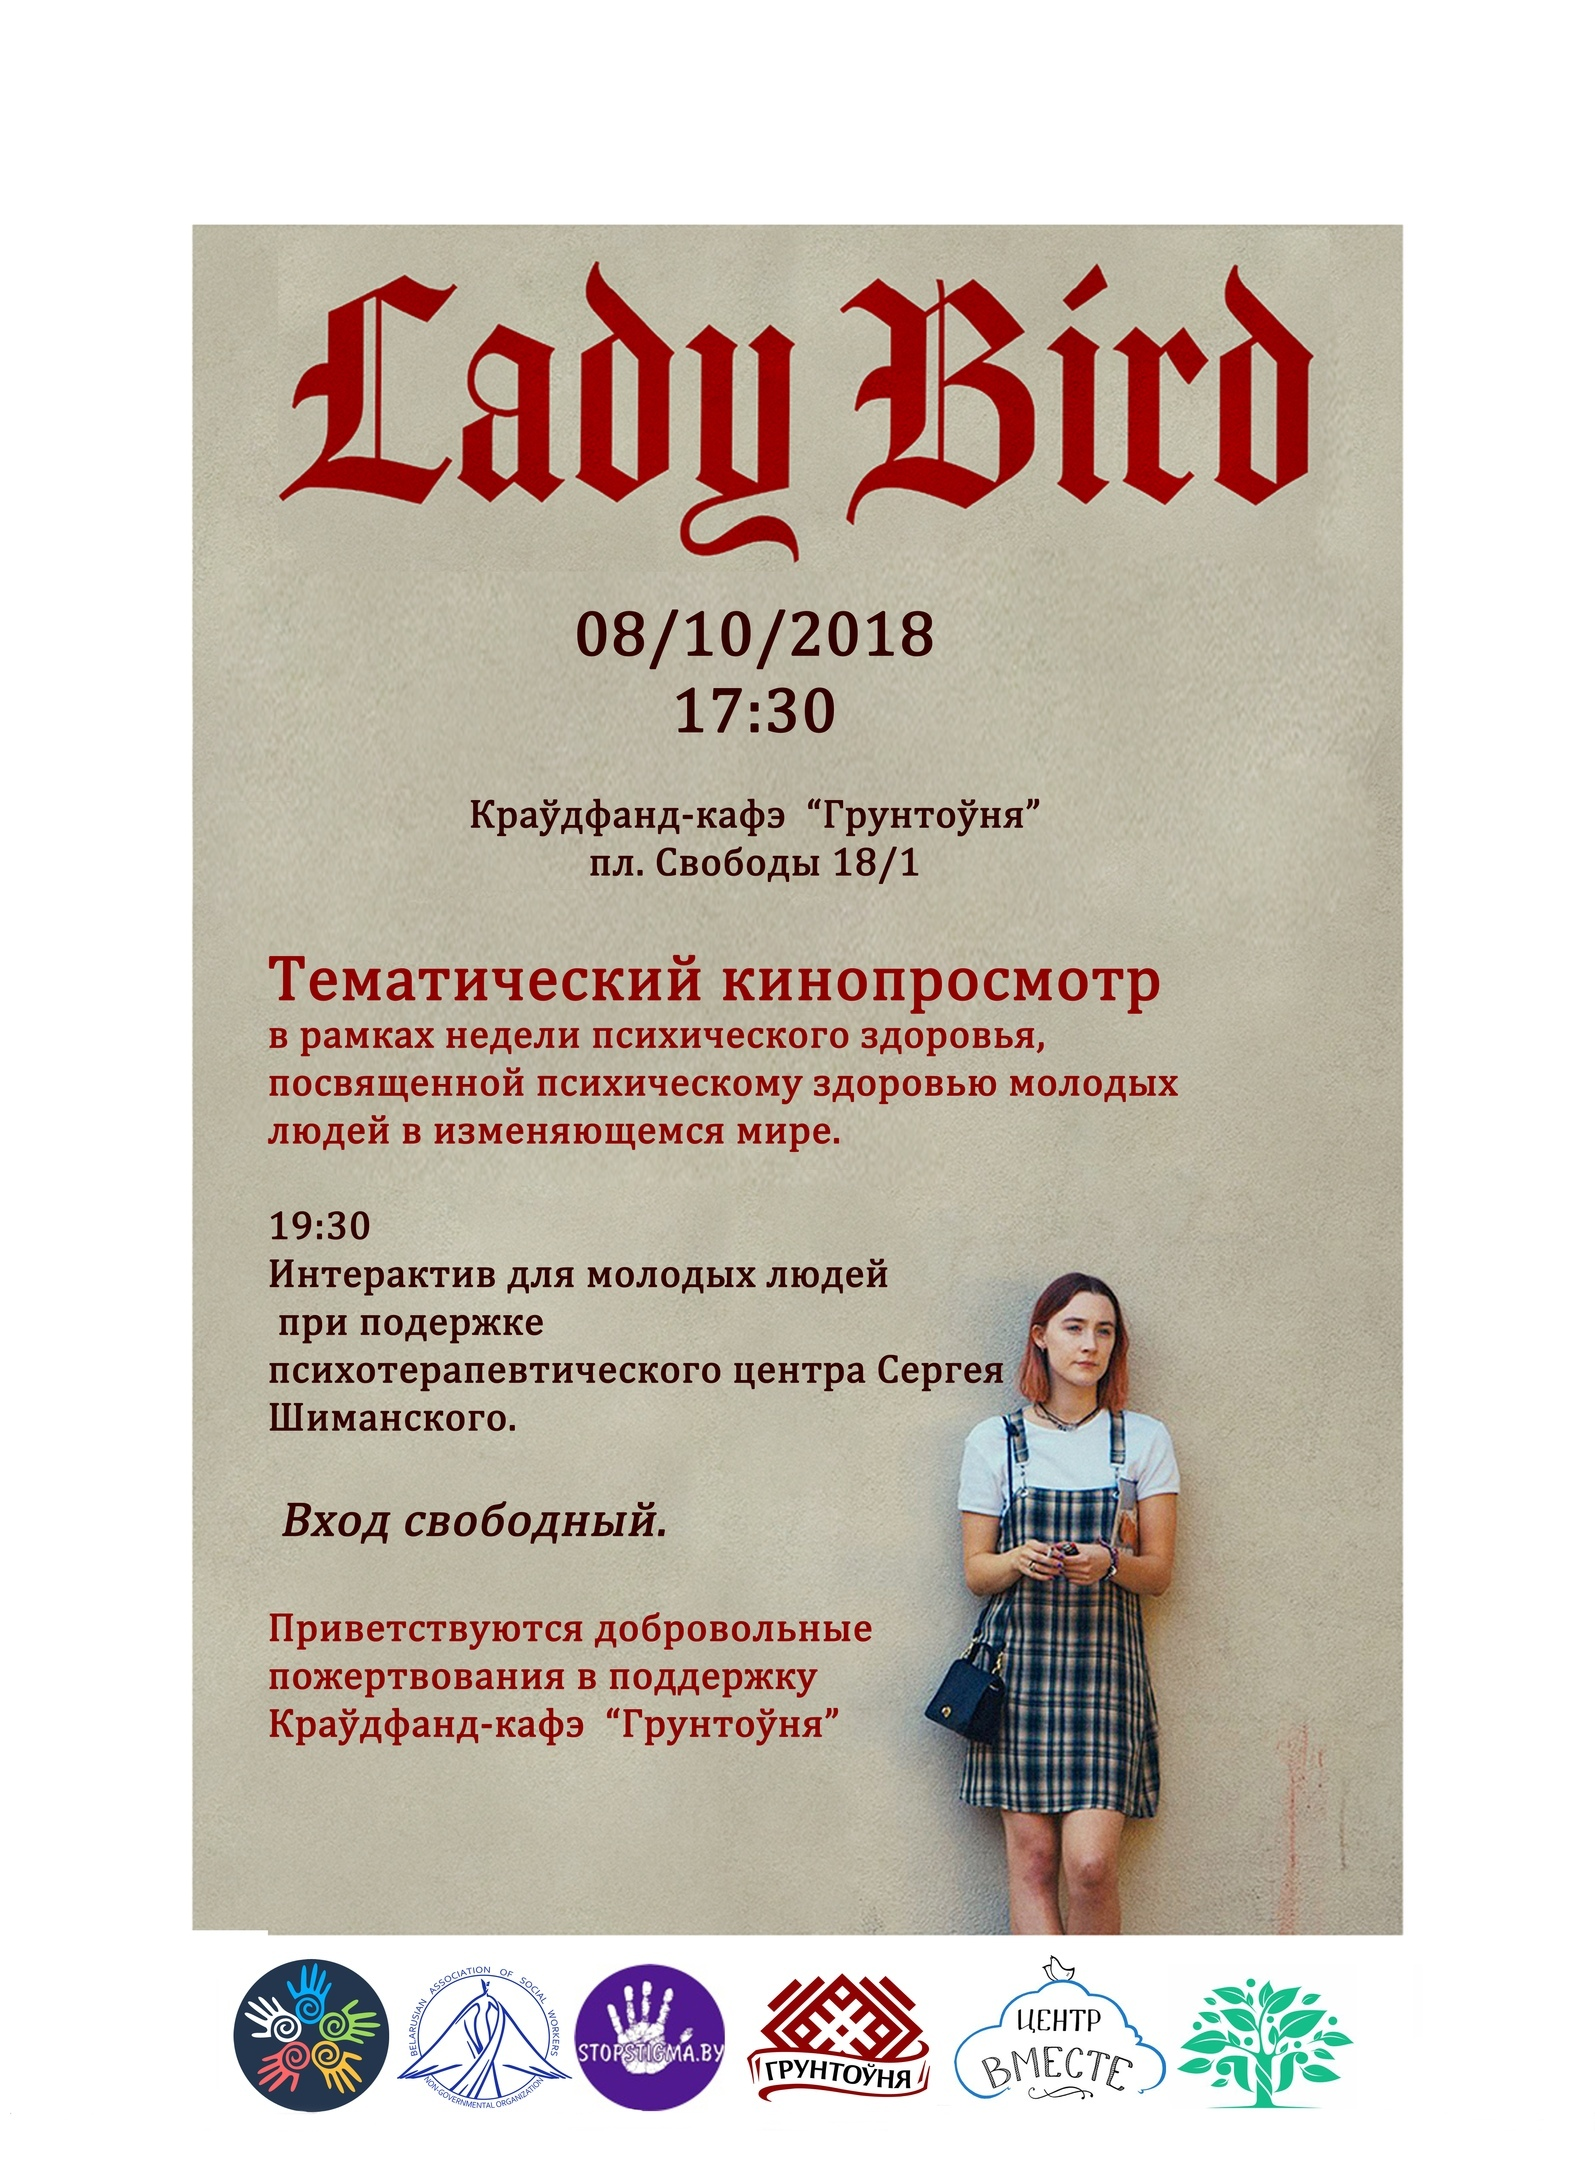 Кинопросмотр Леди Бёрд Брест